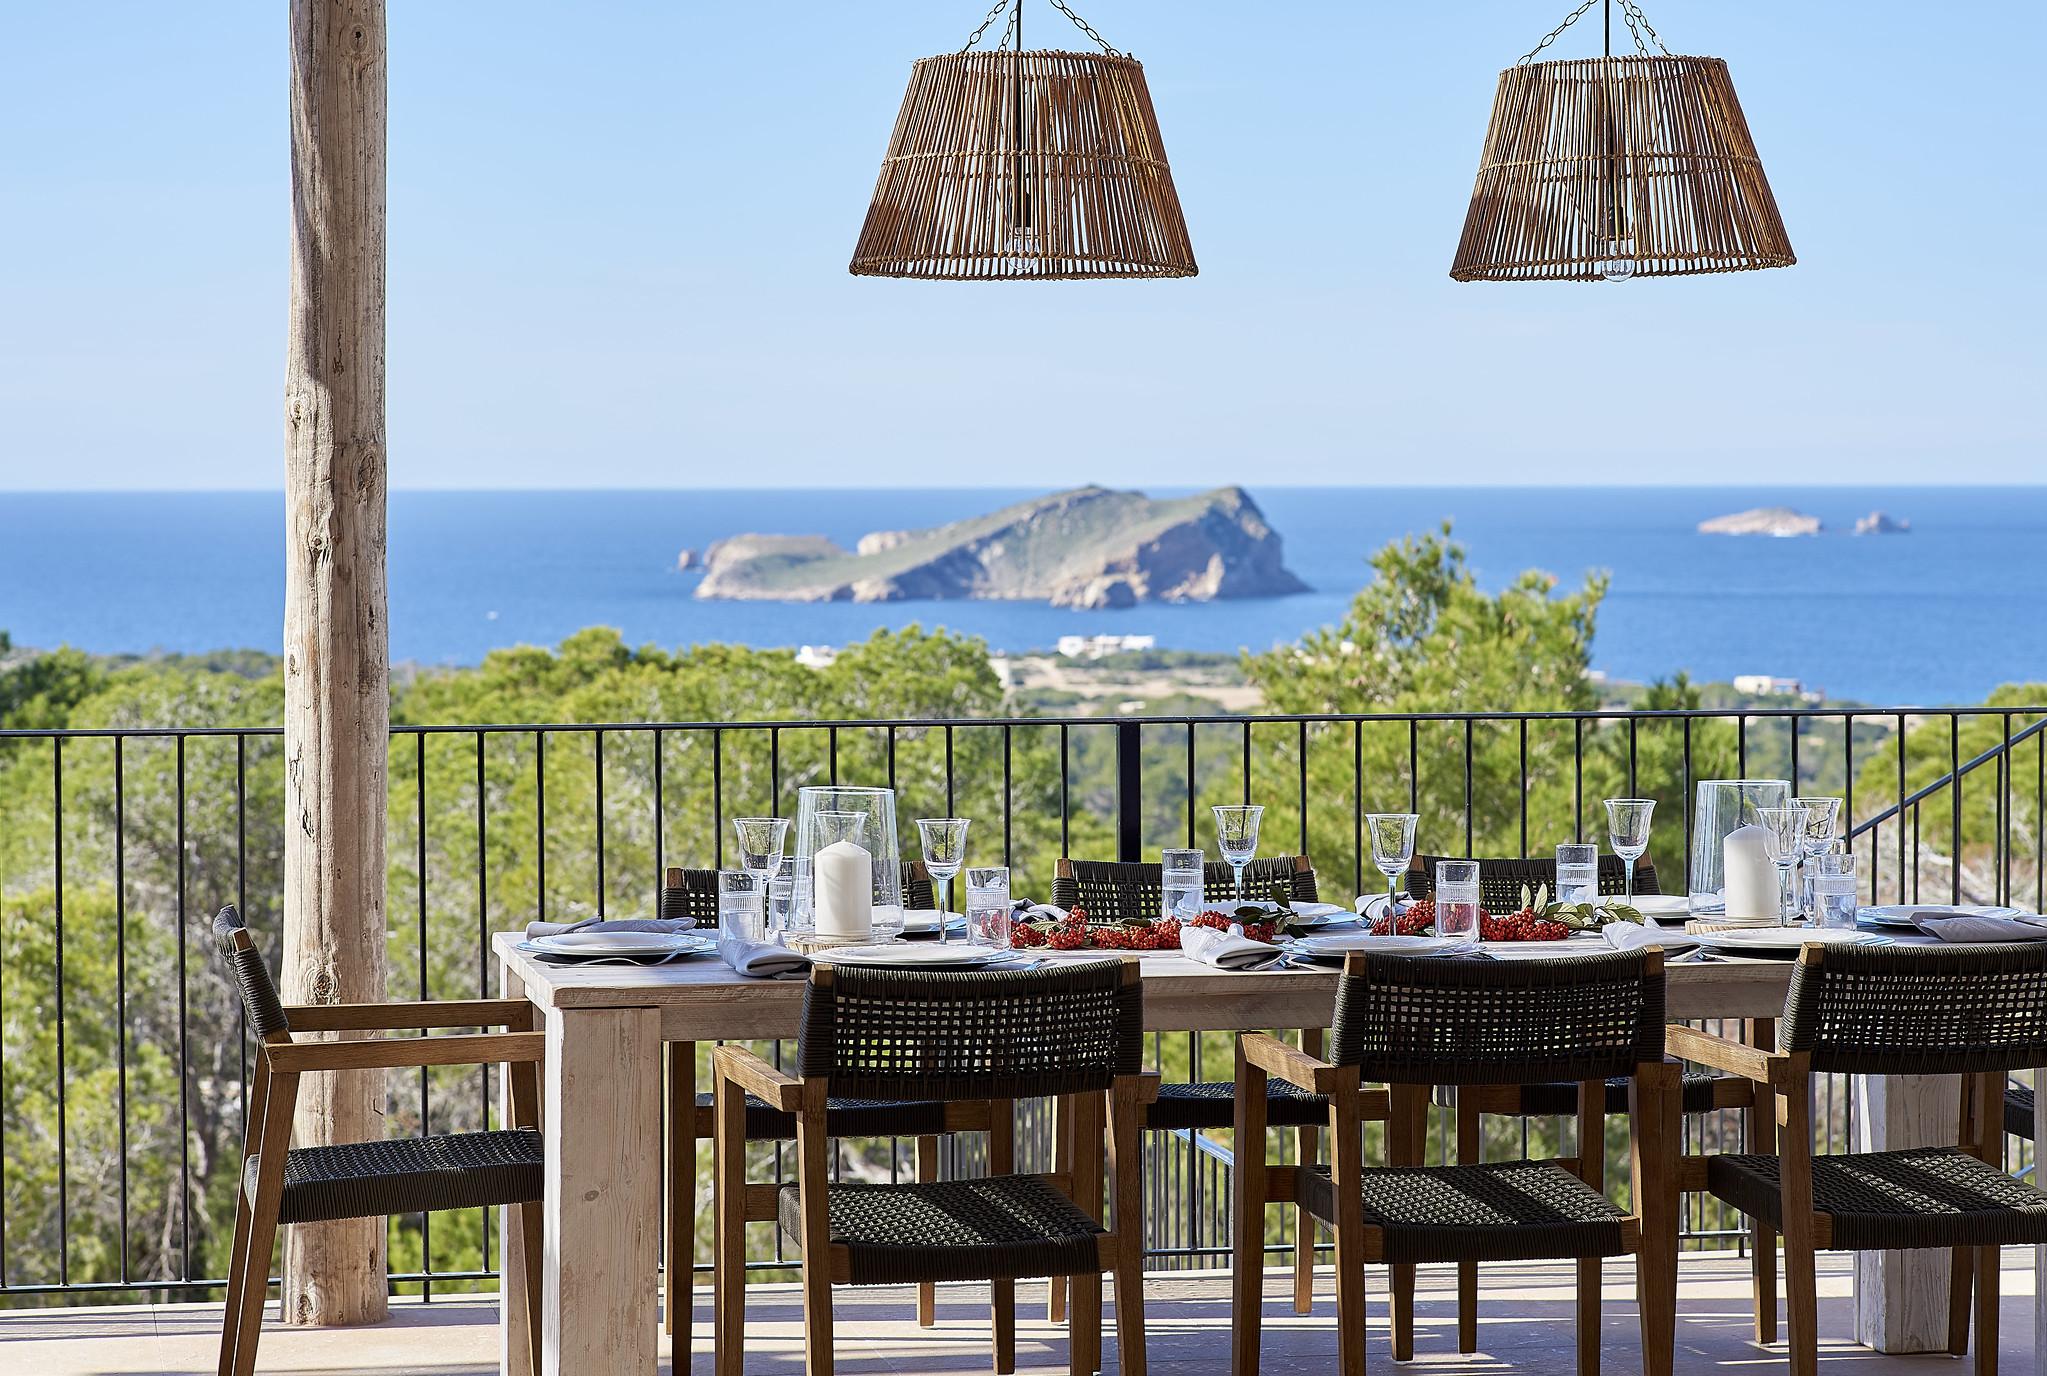 https://www.white-ibiza.com/wp-content/uploads/2020/06/white-ibiza-villas-sa-serra-exterior-view-table.jpg